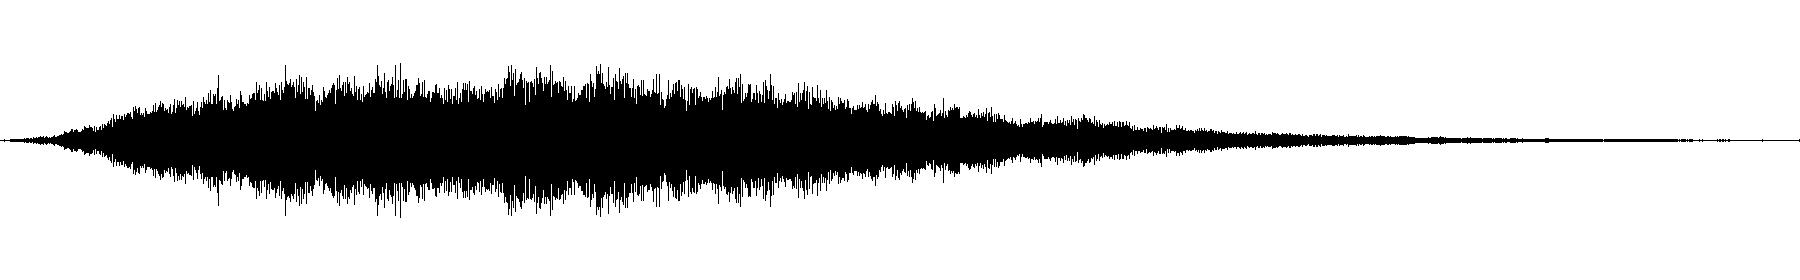 synth choir bm7